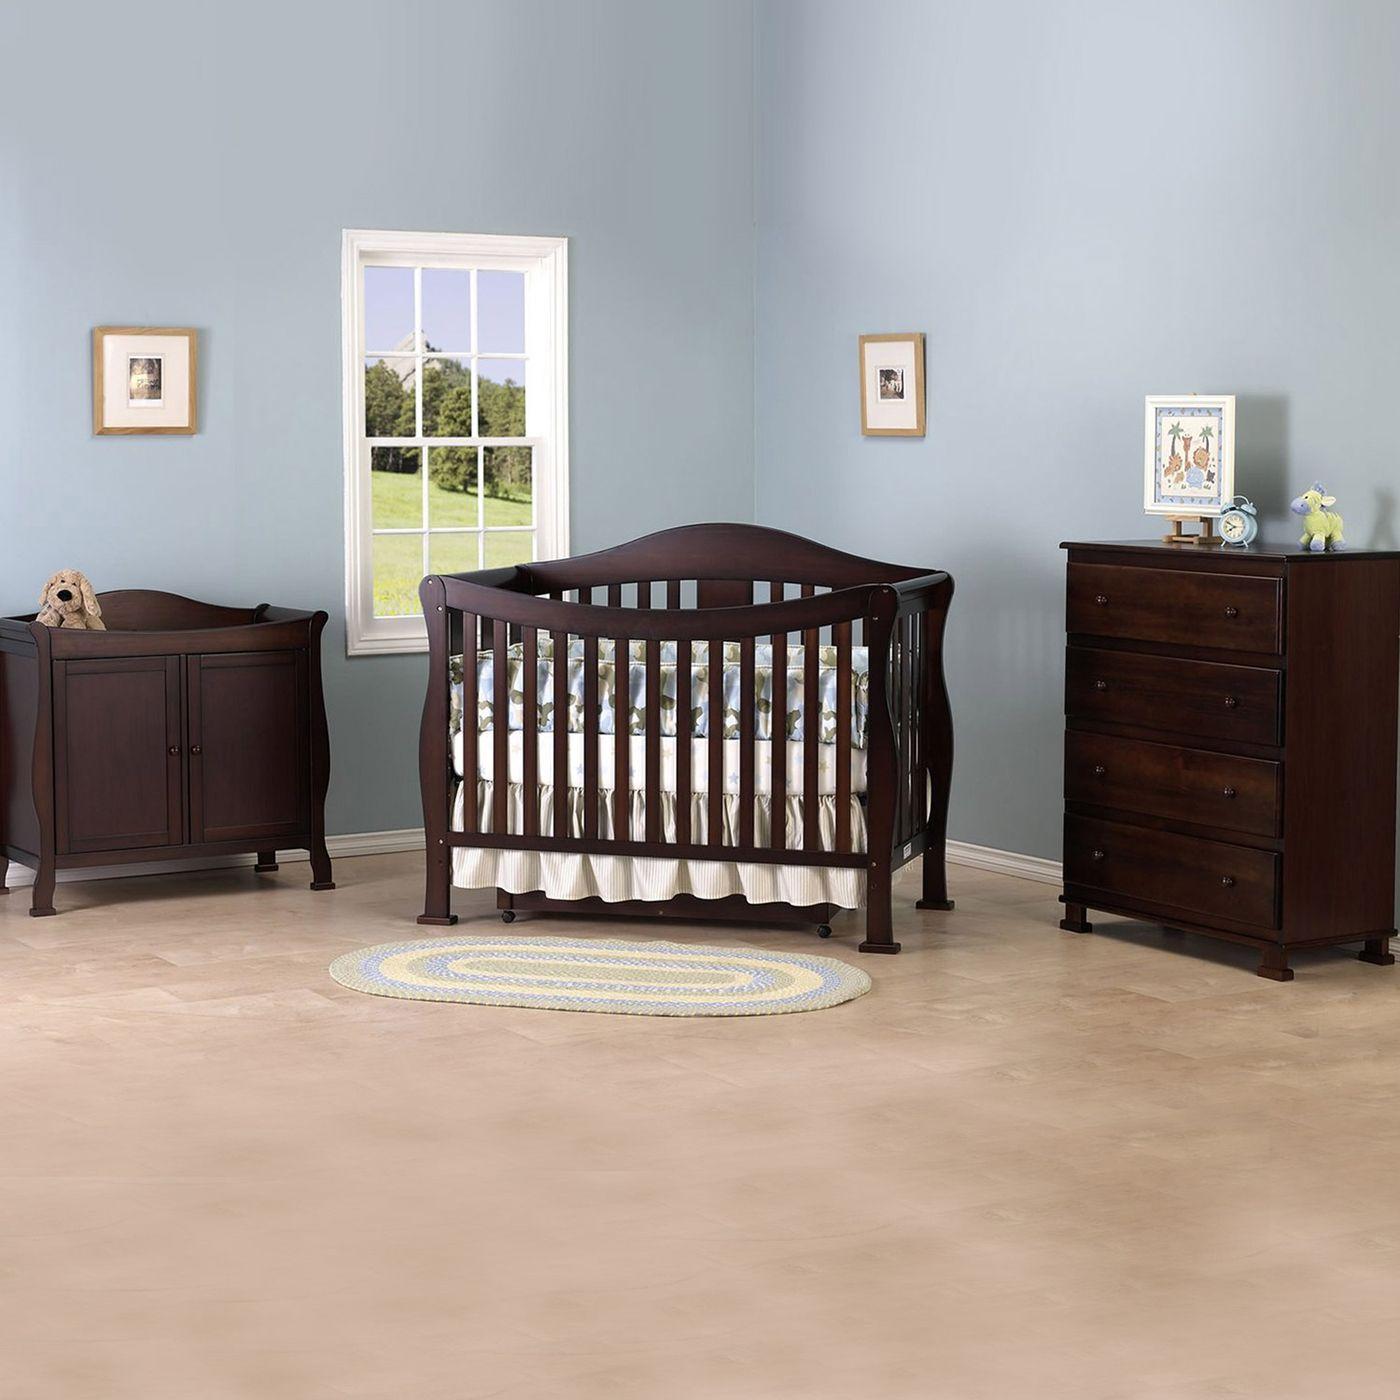 Davinci 3 Piece Nursery Set Parker 4 In 1 Convertible Crib With Toddler Rail